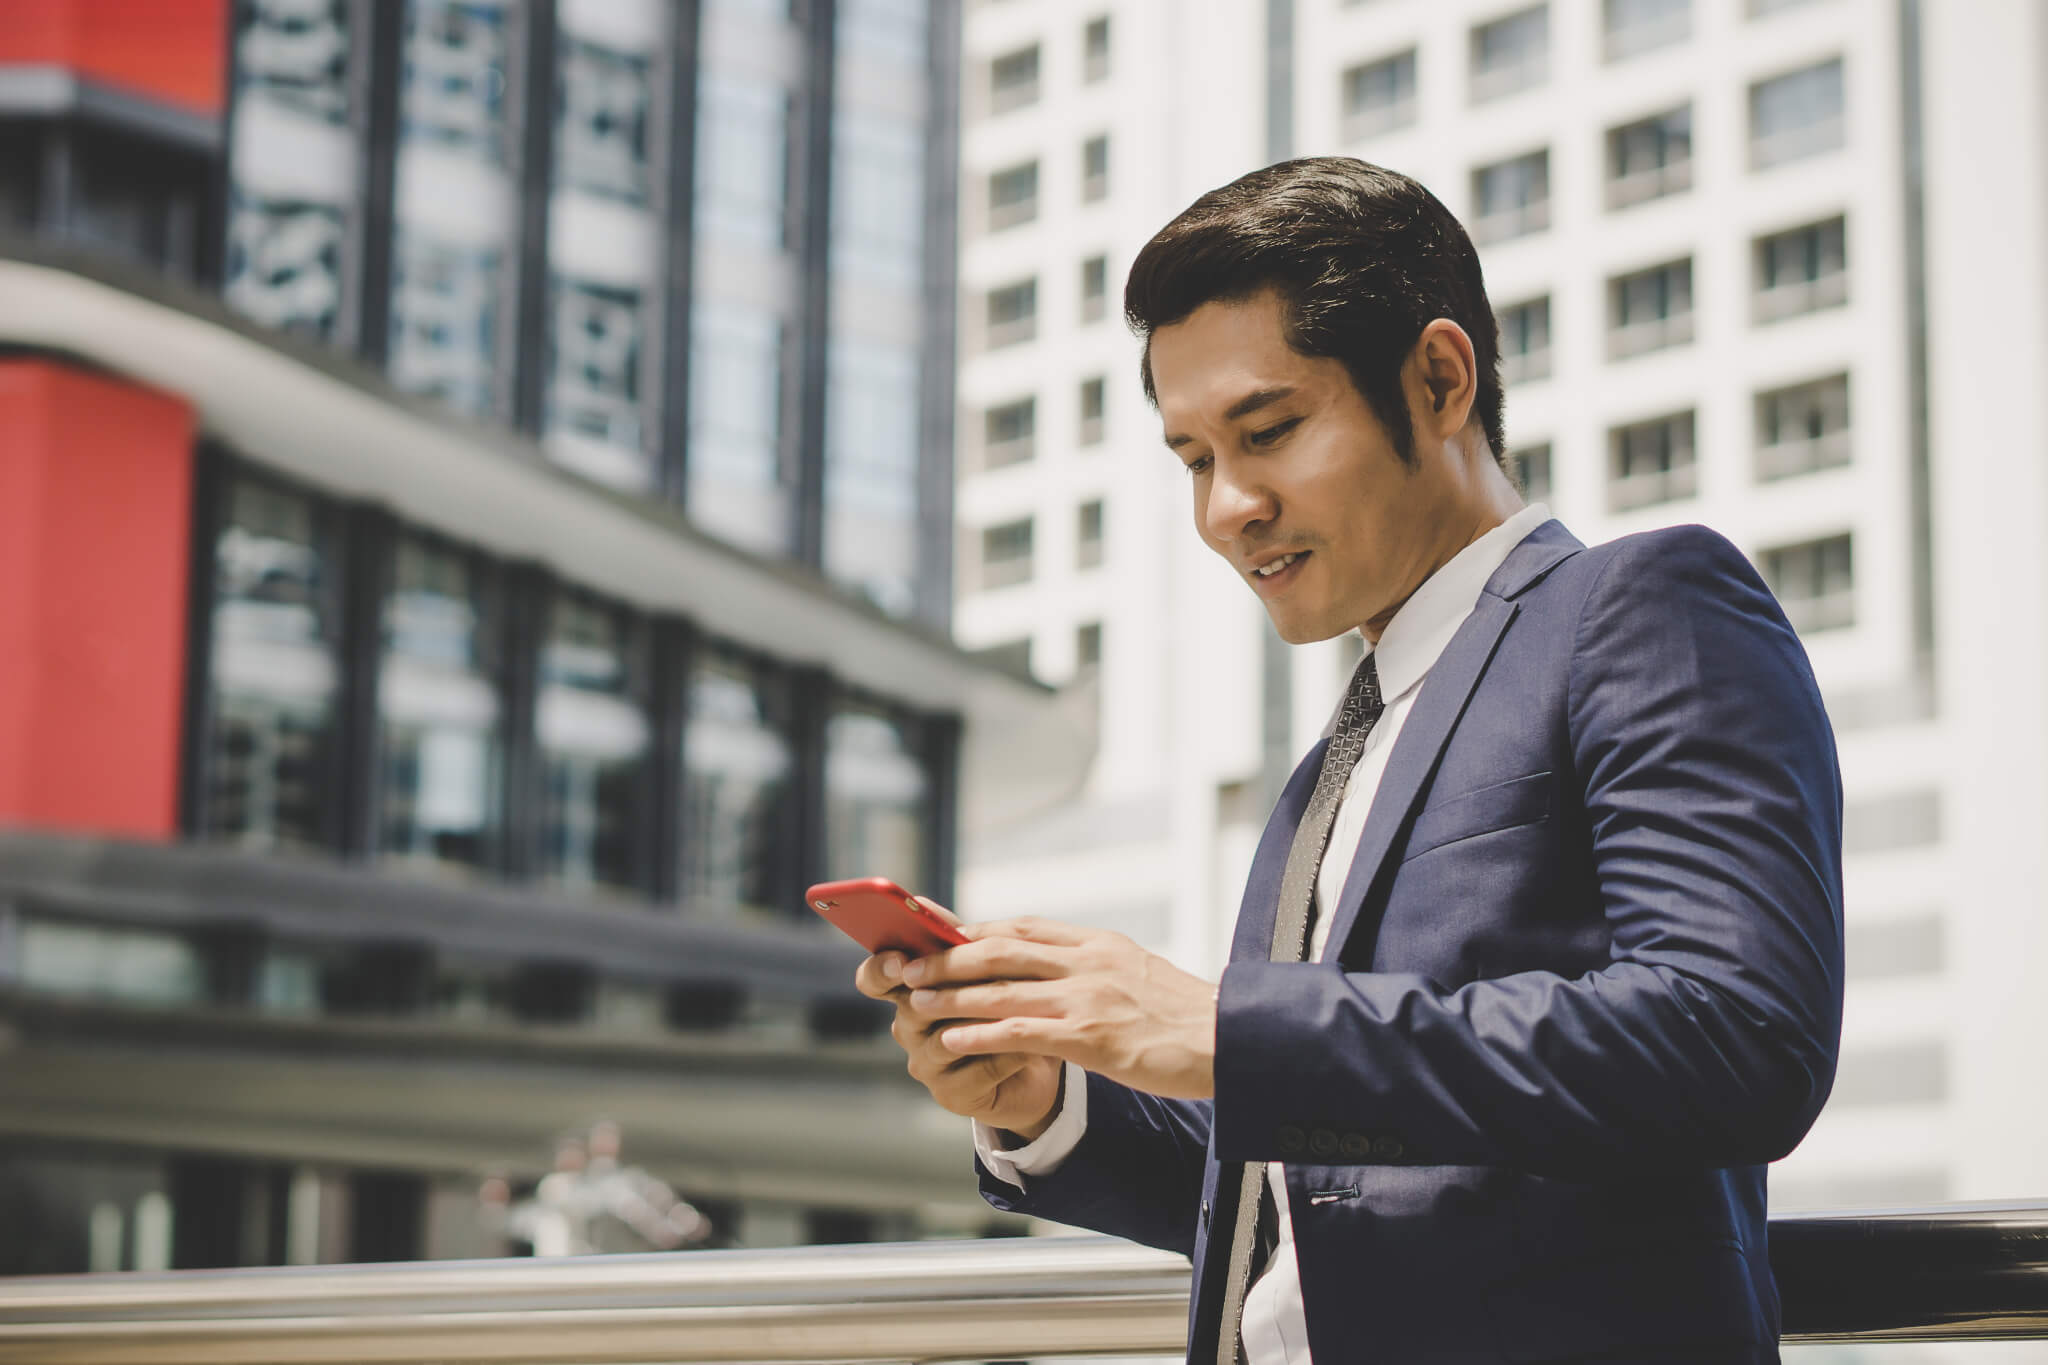 Portrait of happy businessman using telephone outdoors